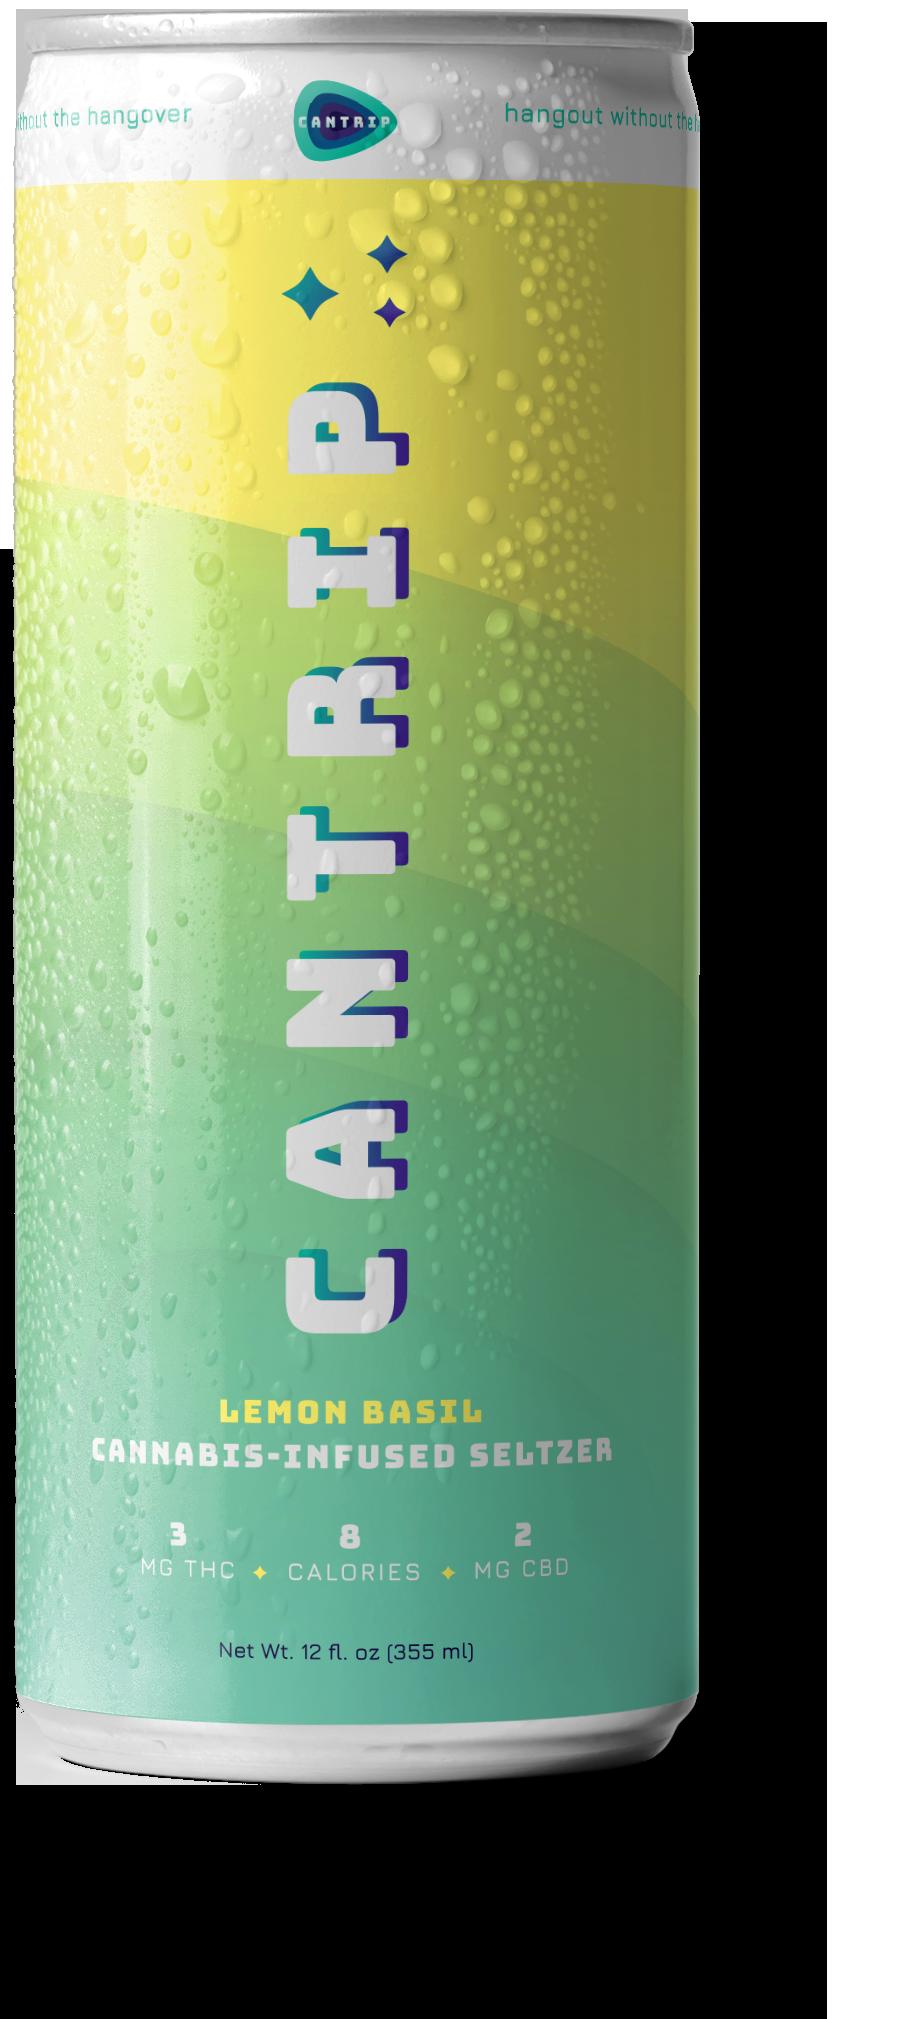 The Cantrip cannabis-infused seltzer Lemon Basil can.